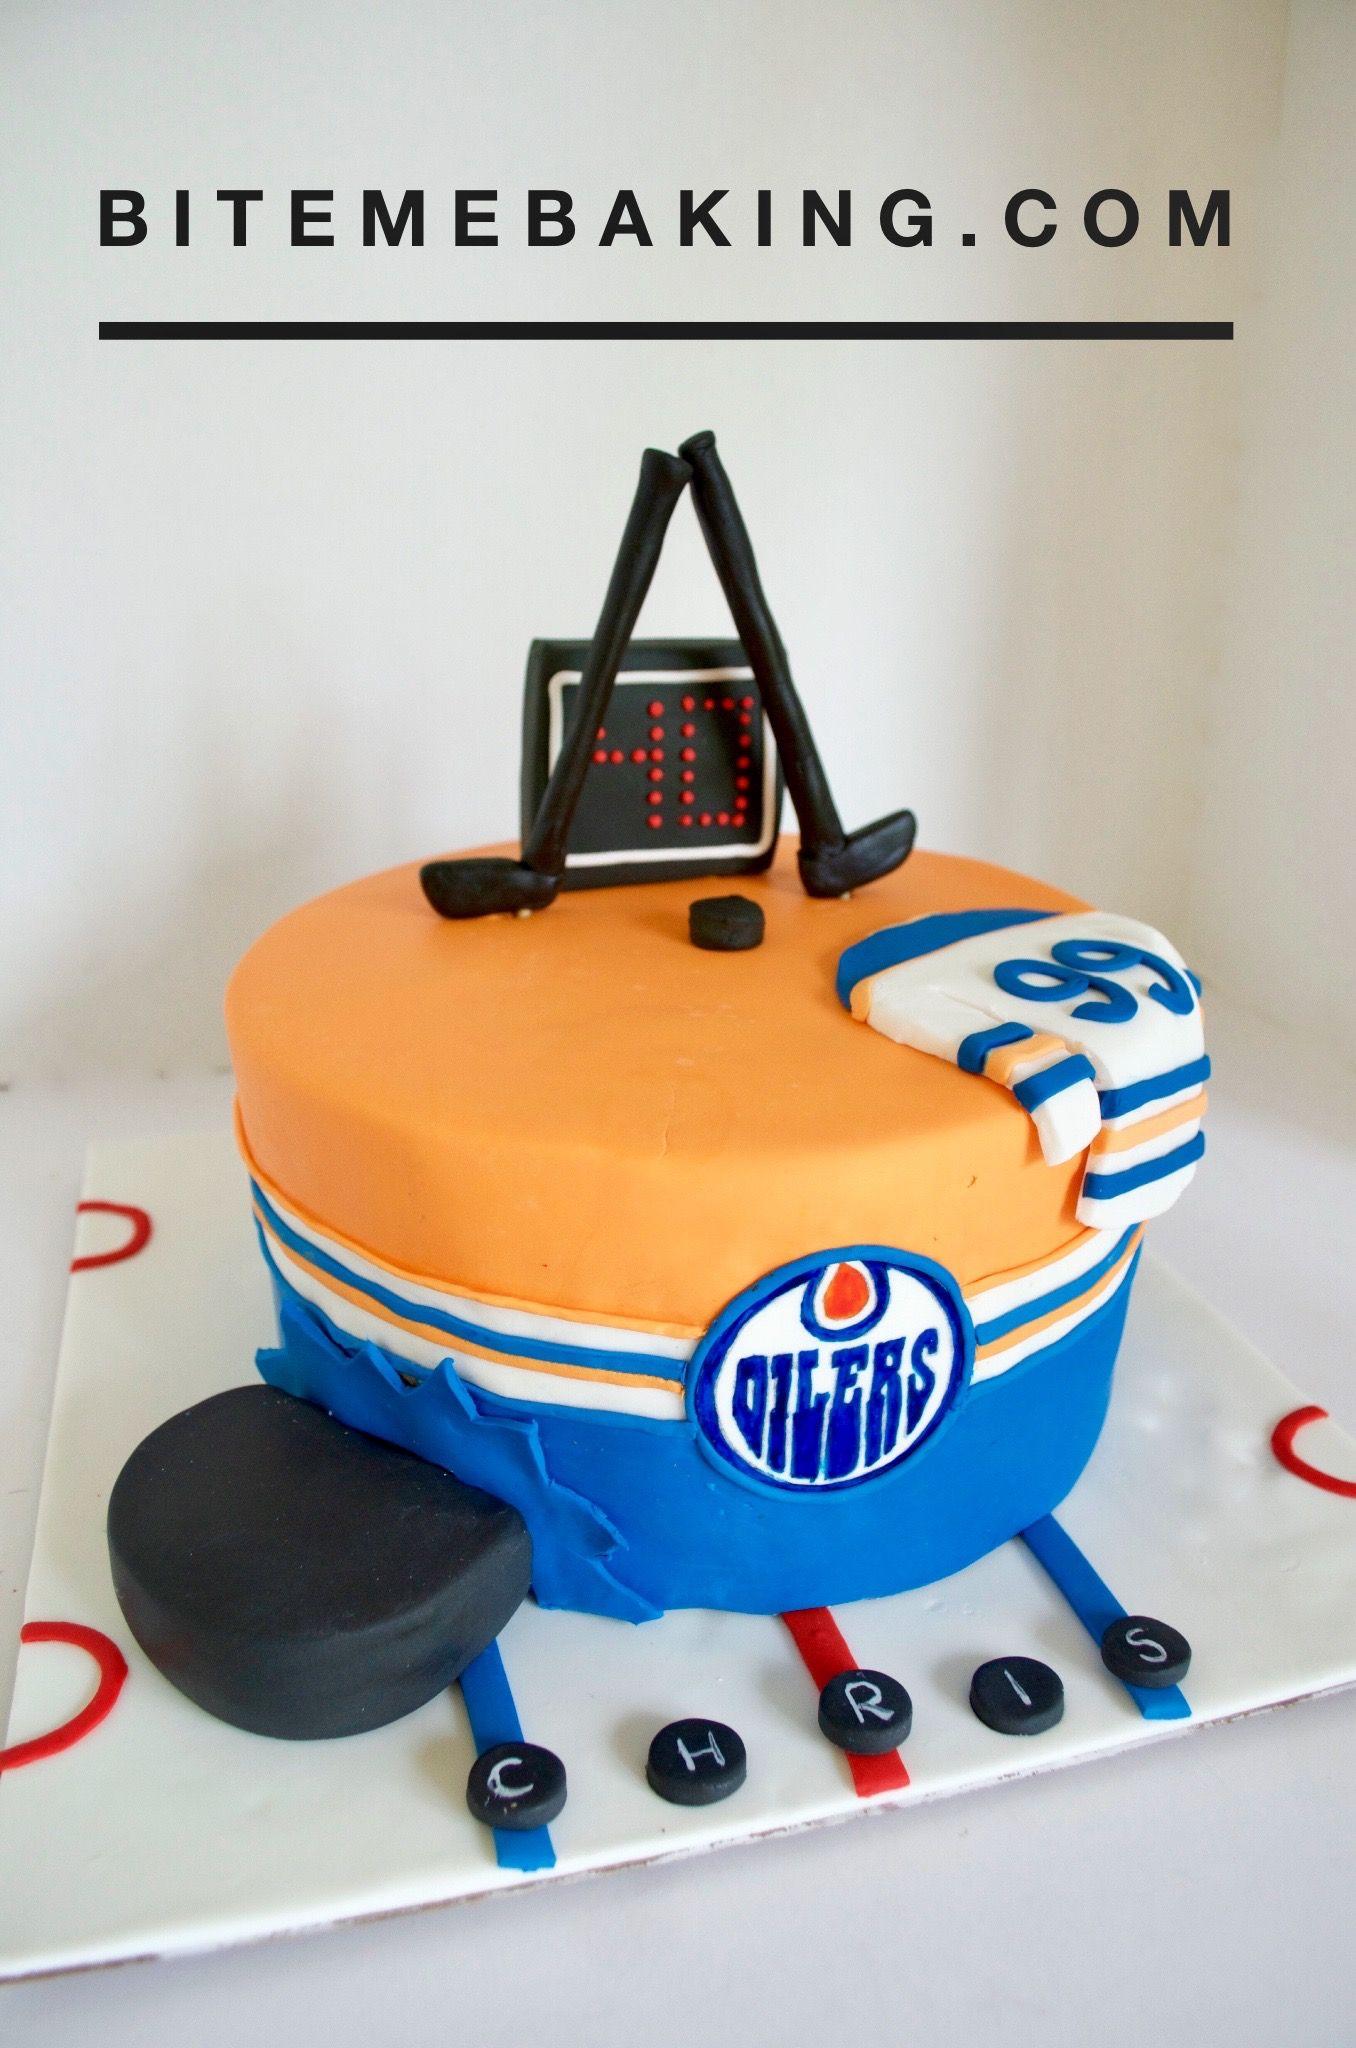 Hockey Sports Theme Cupcake Stand Hockey Party cake Wood Cupcake Stand Tower Hockey Puck Themed Basketball Cupcake Hockey Sports Theme Party